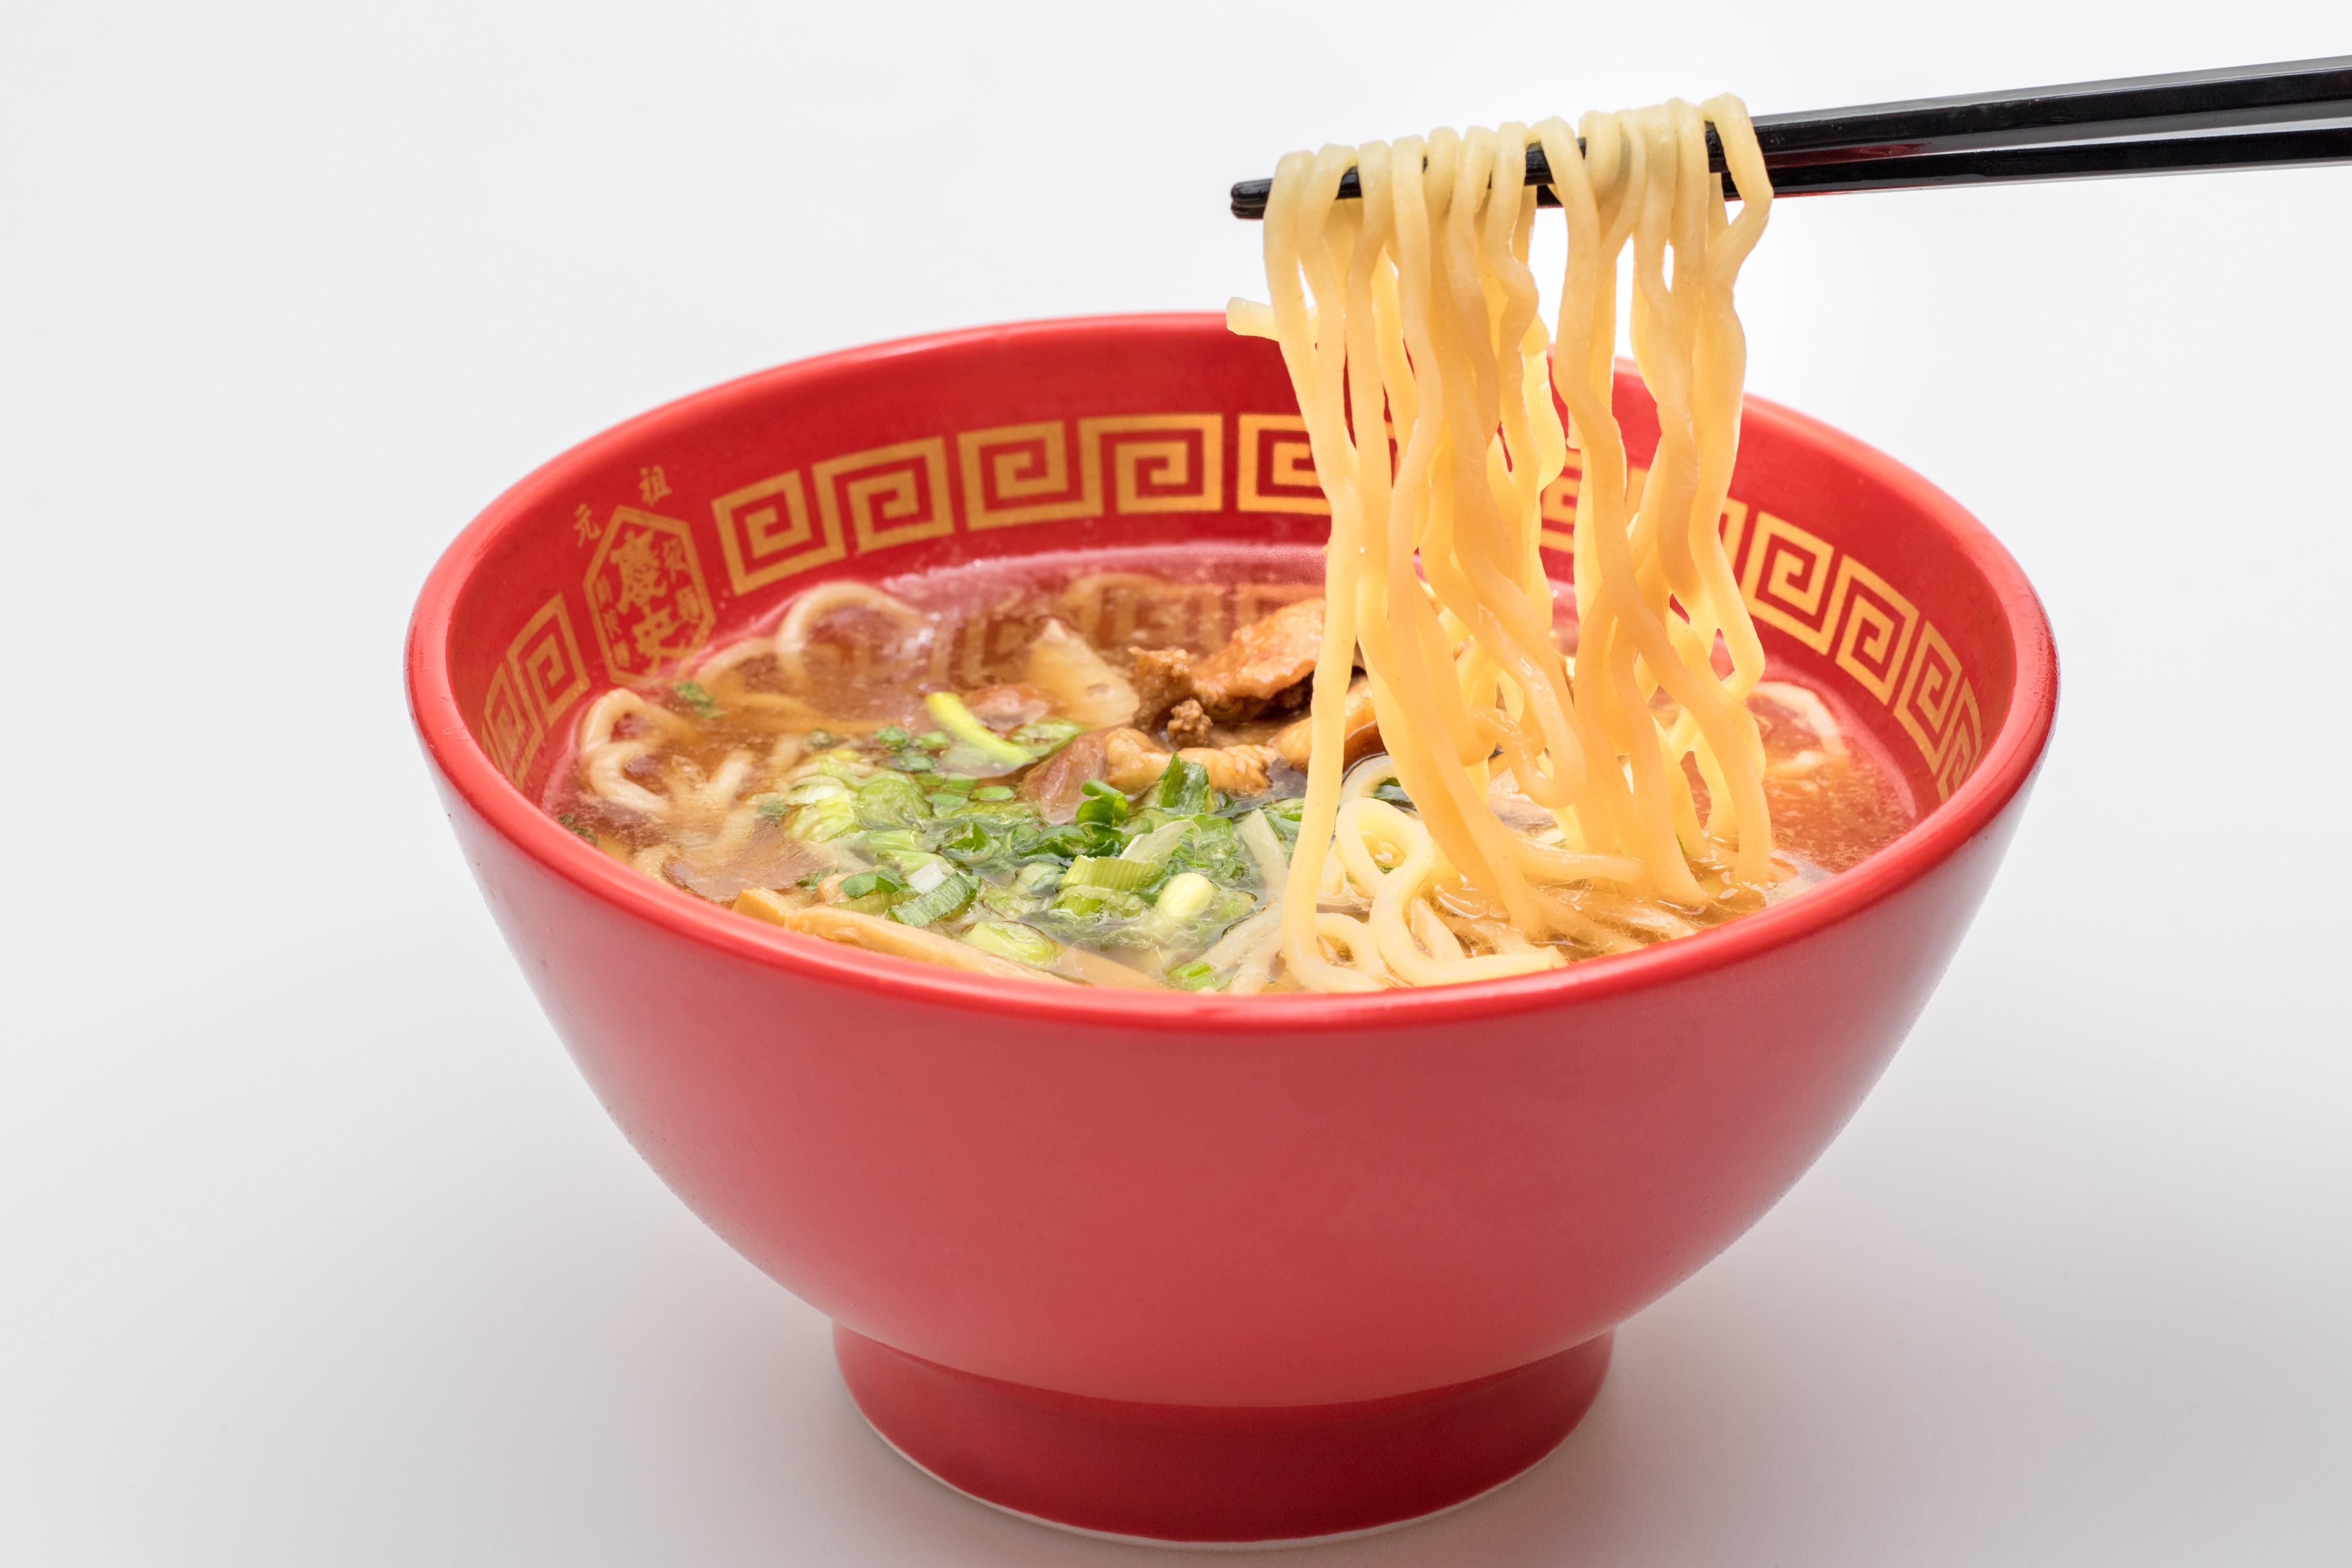 Menya Keishi 麺屋慶史 創作麺 by Hakata Ikkosha 博多一幸舎